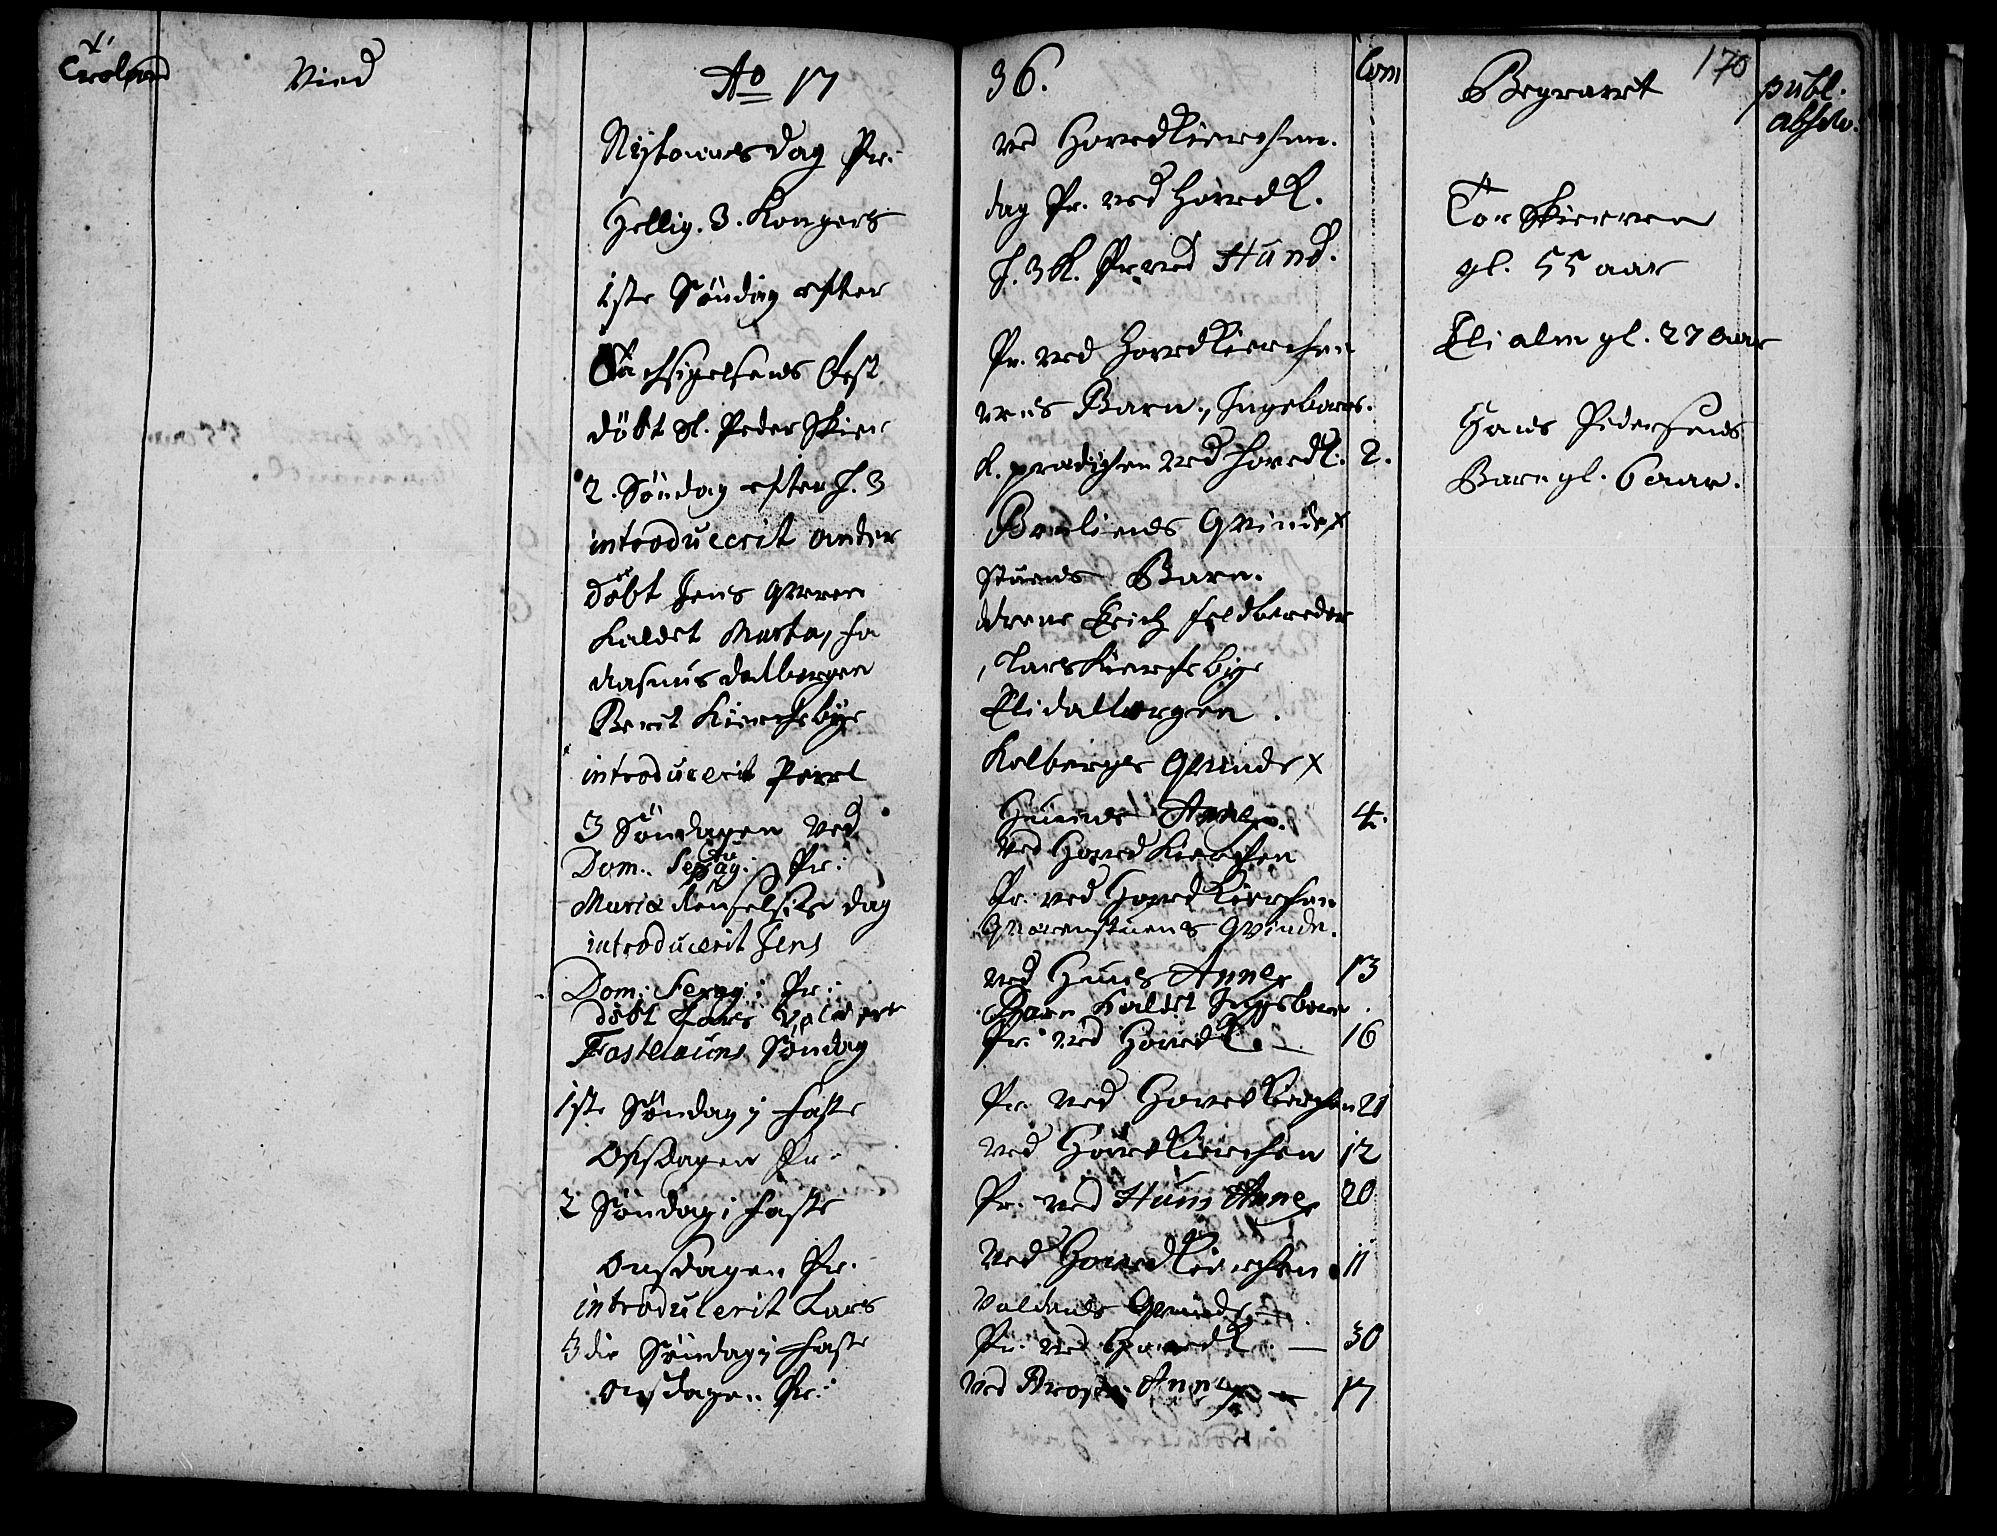 SAH, Vardal prestekontor, H/Ha/Haa/L0001: Ministerialbok nr. 1, 1706-1748, s. 170